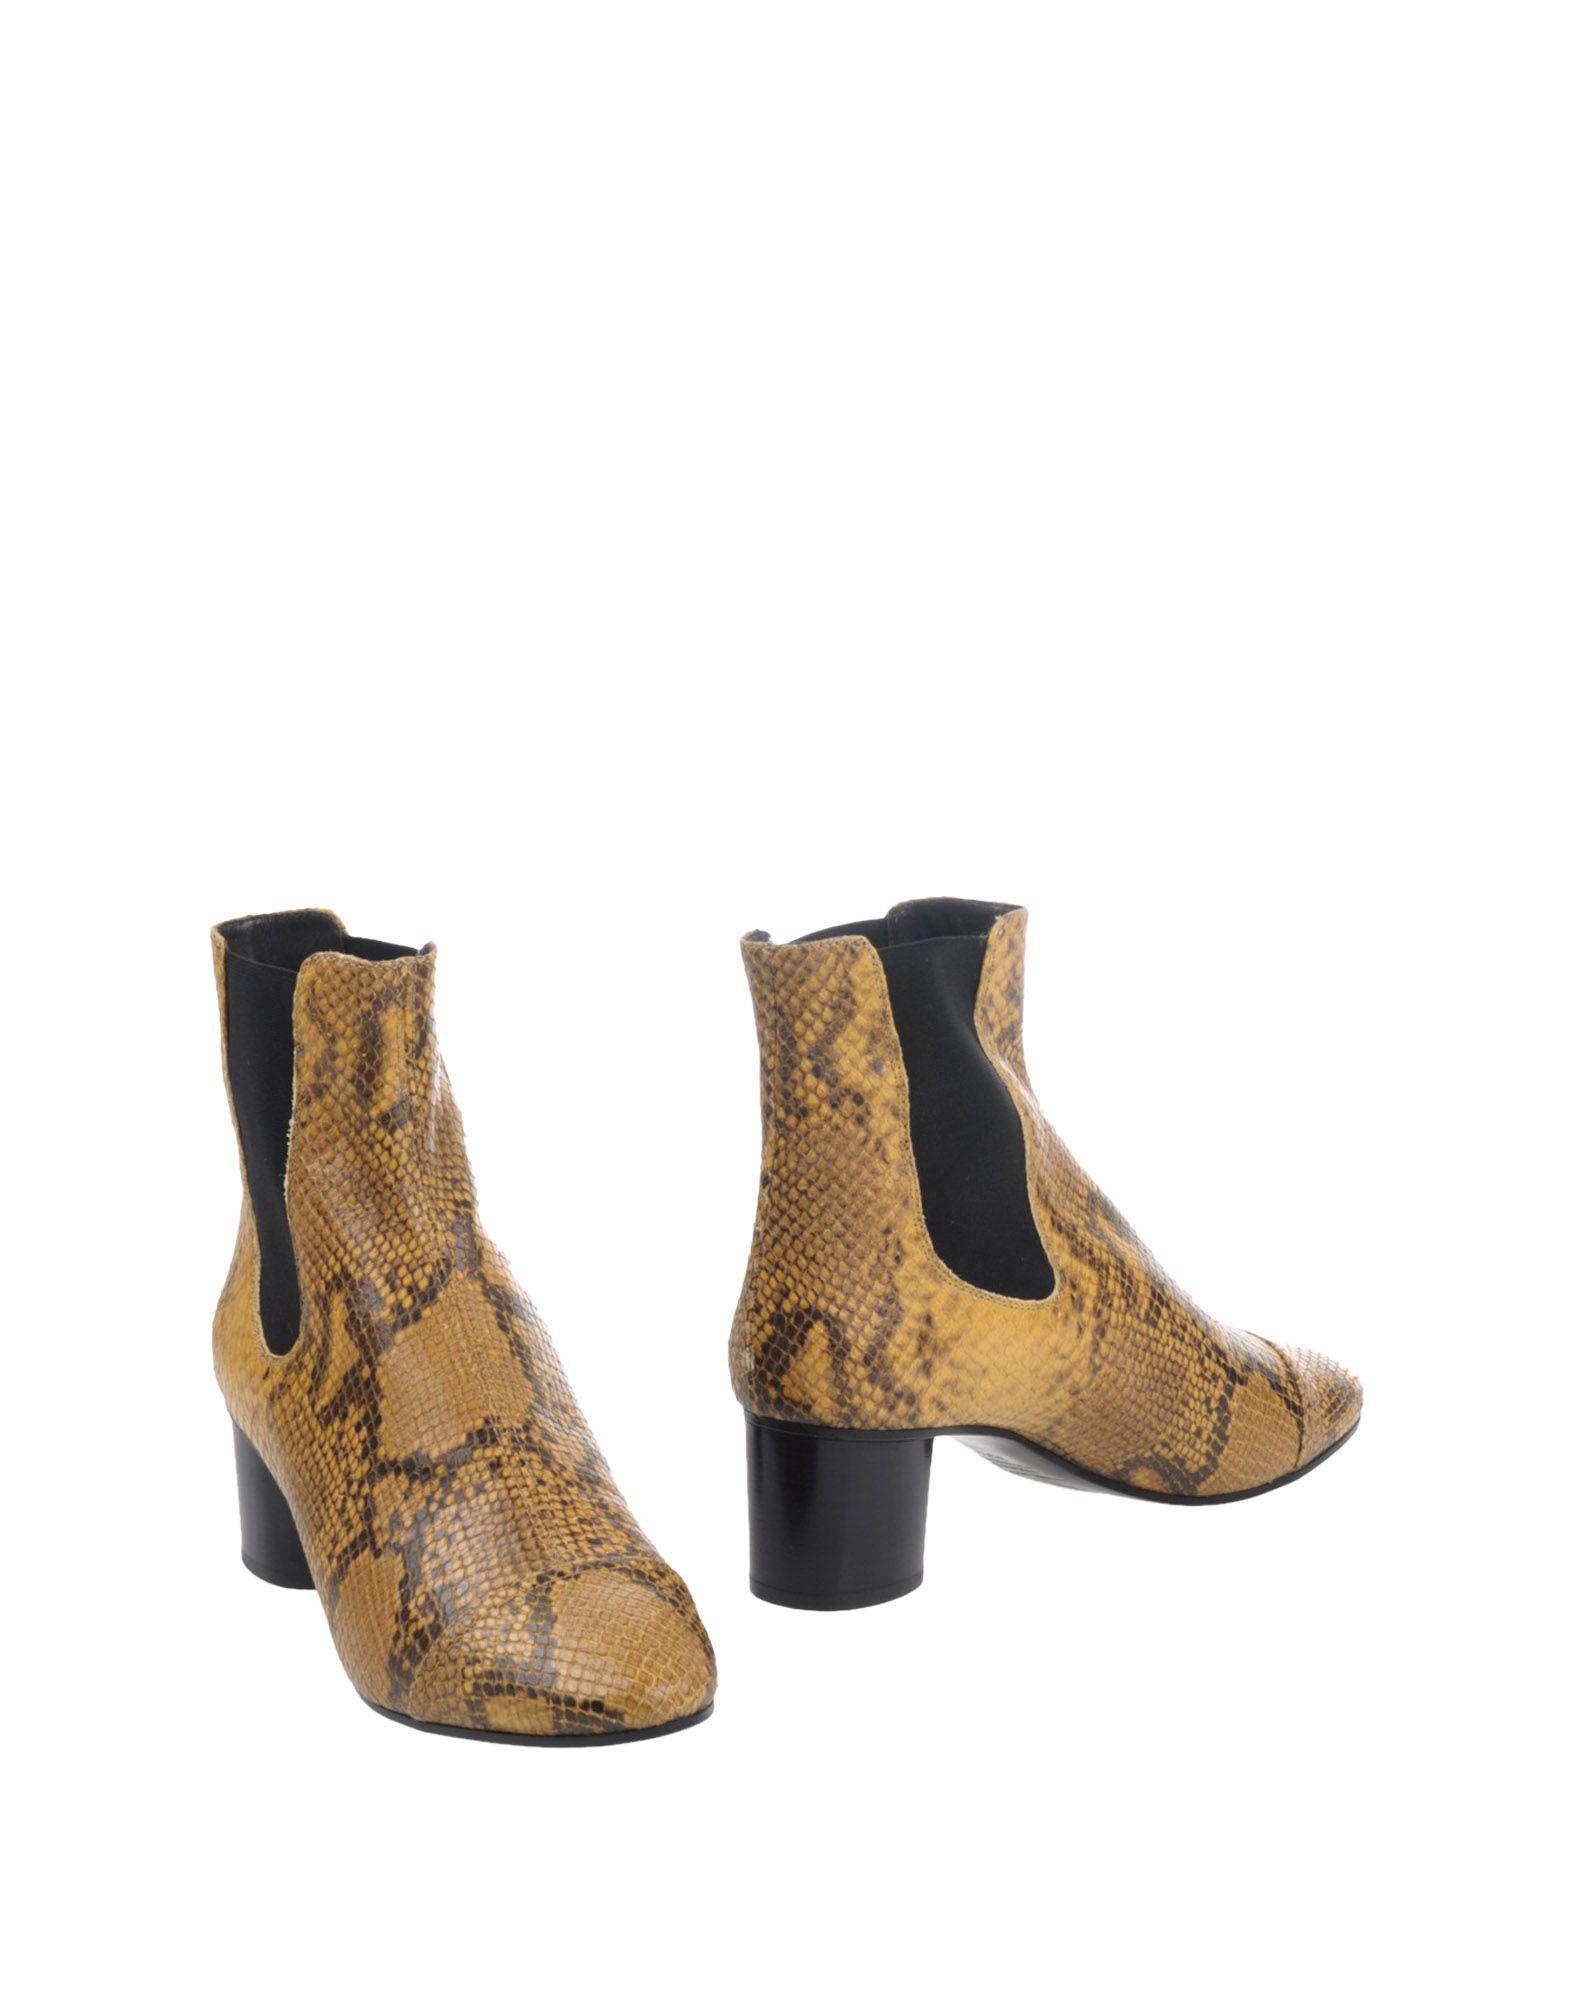 ФОТО isabel marant полусапоги и высокие ботинки